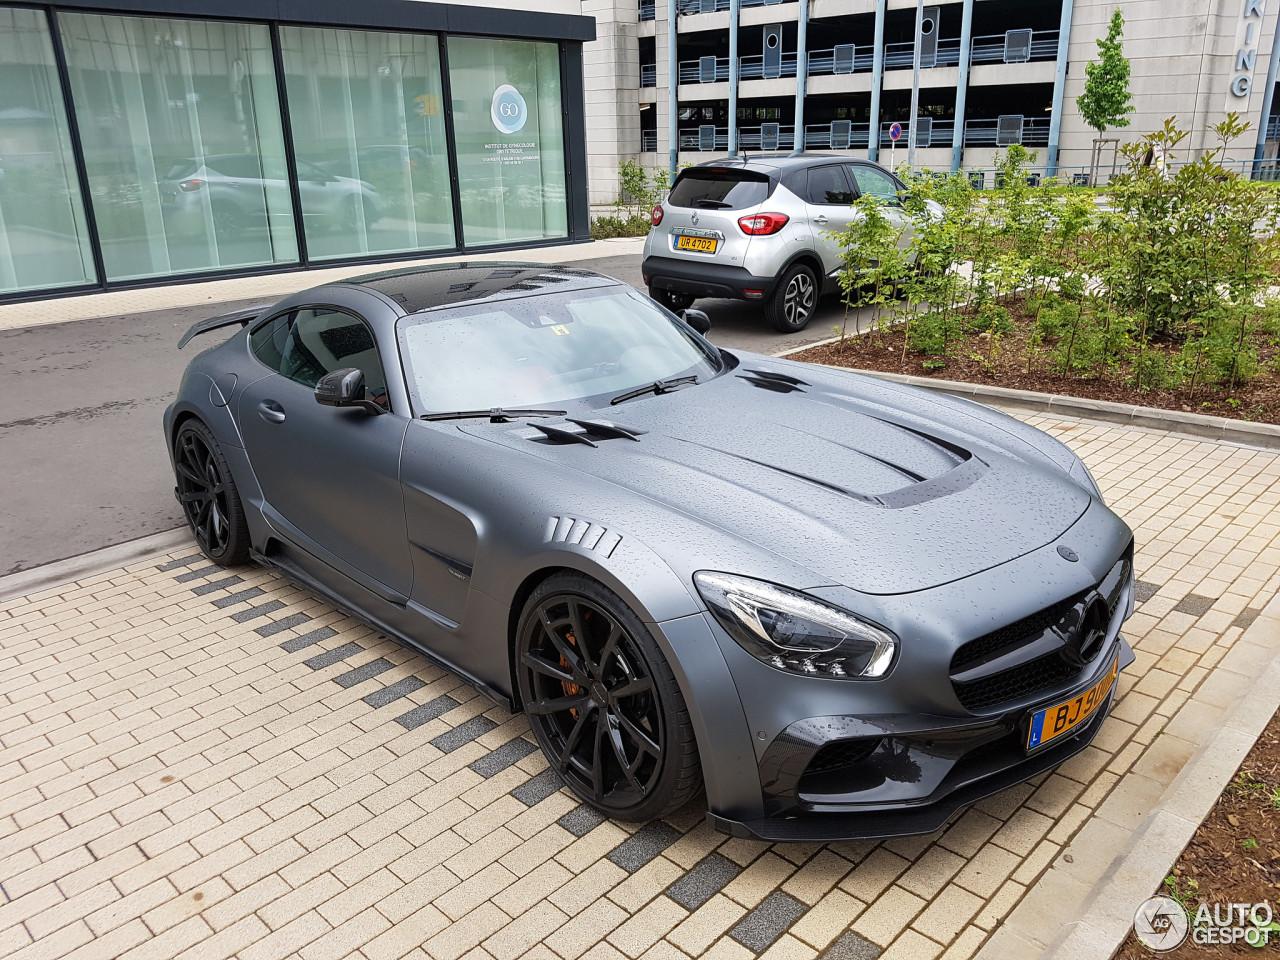 Mercedes-AMG Mansory GTS - 3 July 2016 - Autogespot